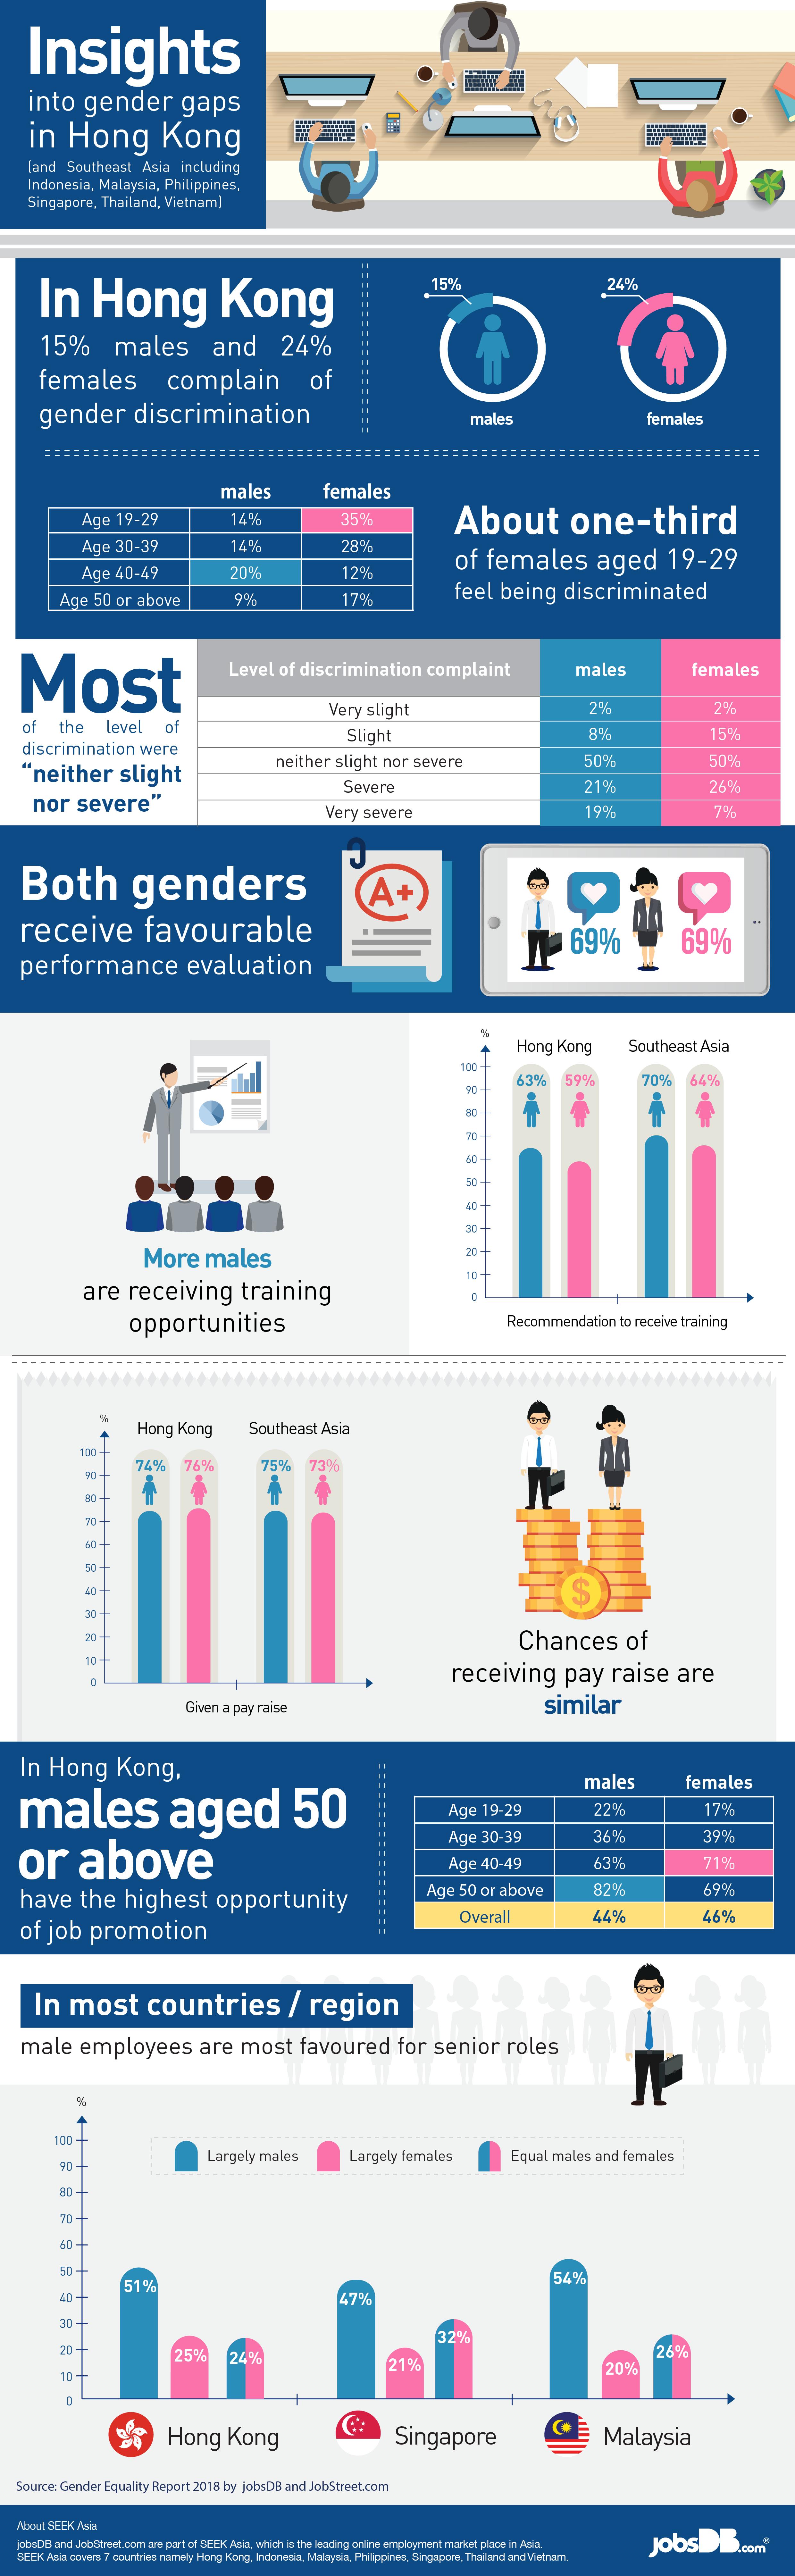 jobsDB 2018 Gender Equality report